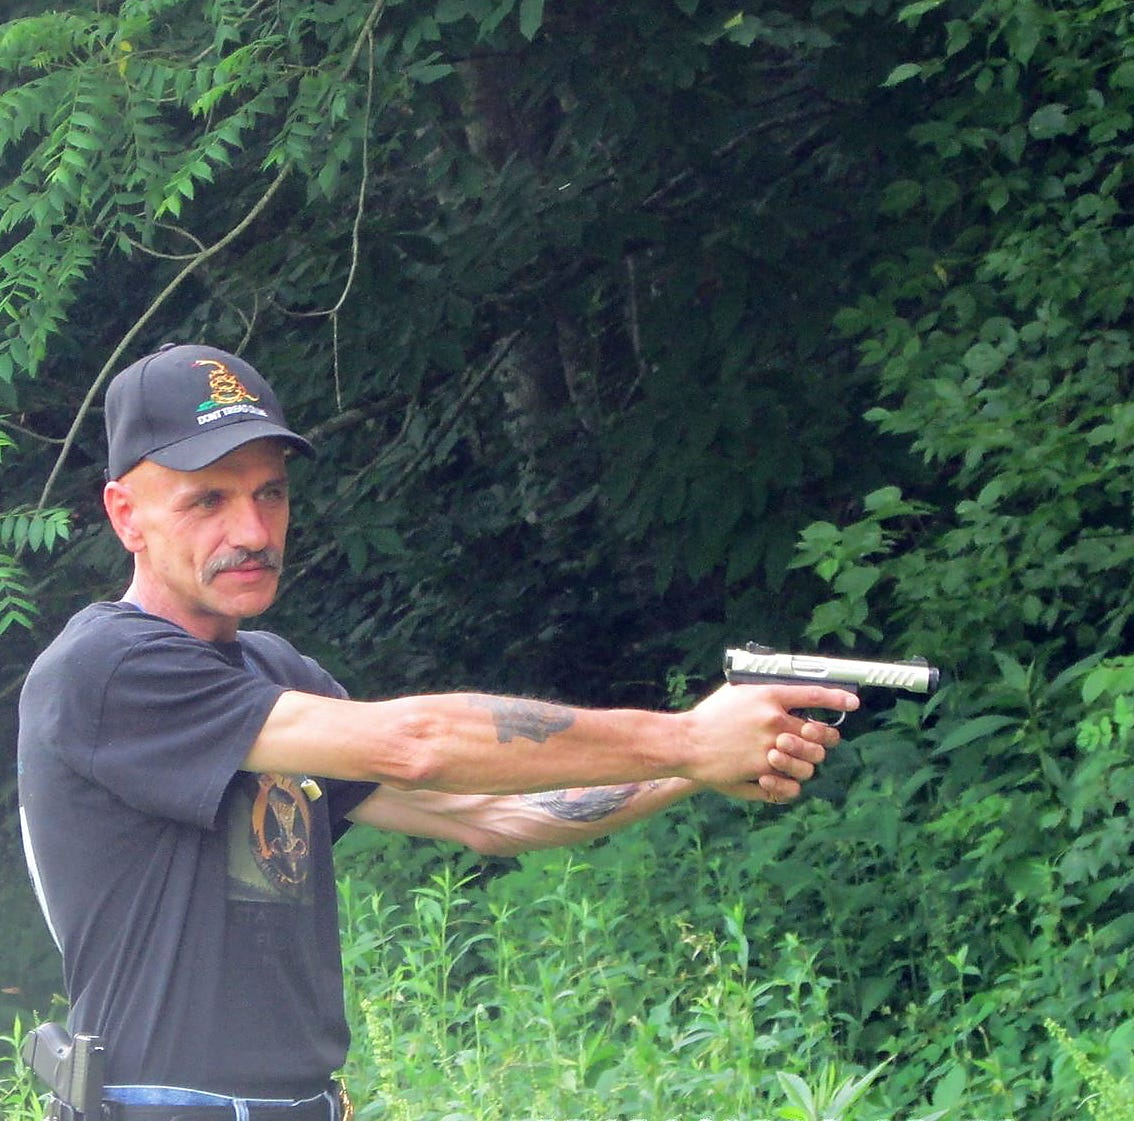 Shopper News blog: Gun-safety expert brings conviction to training